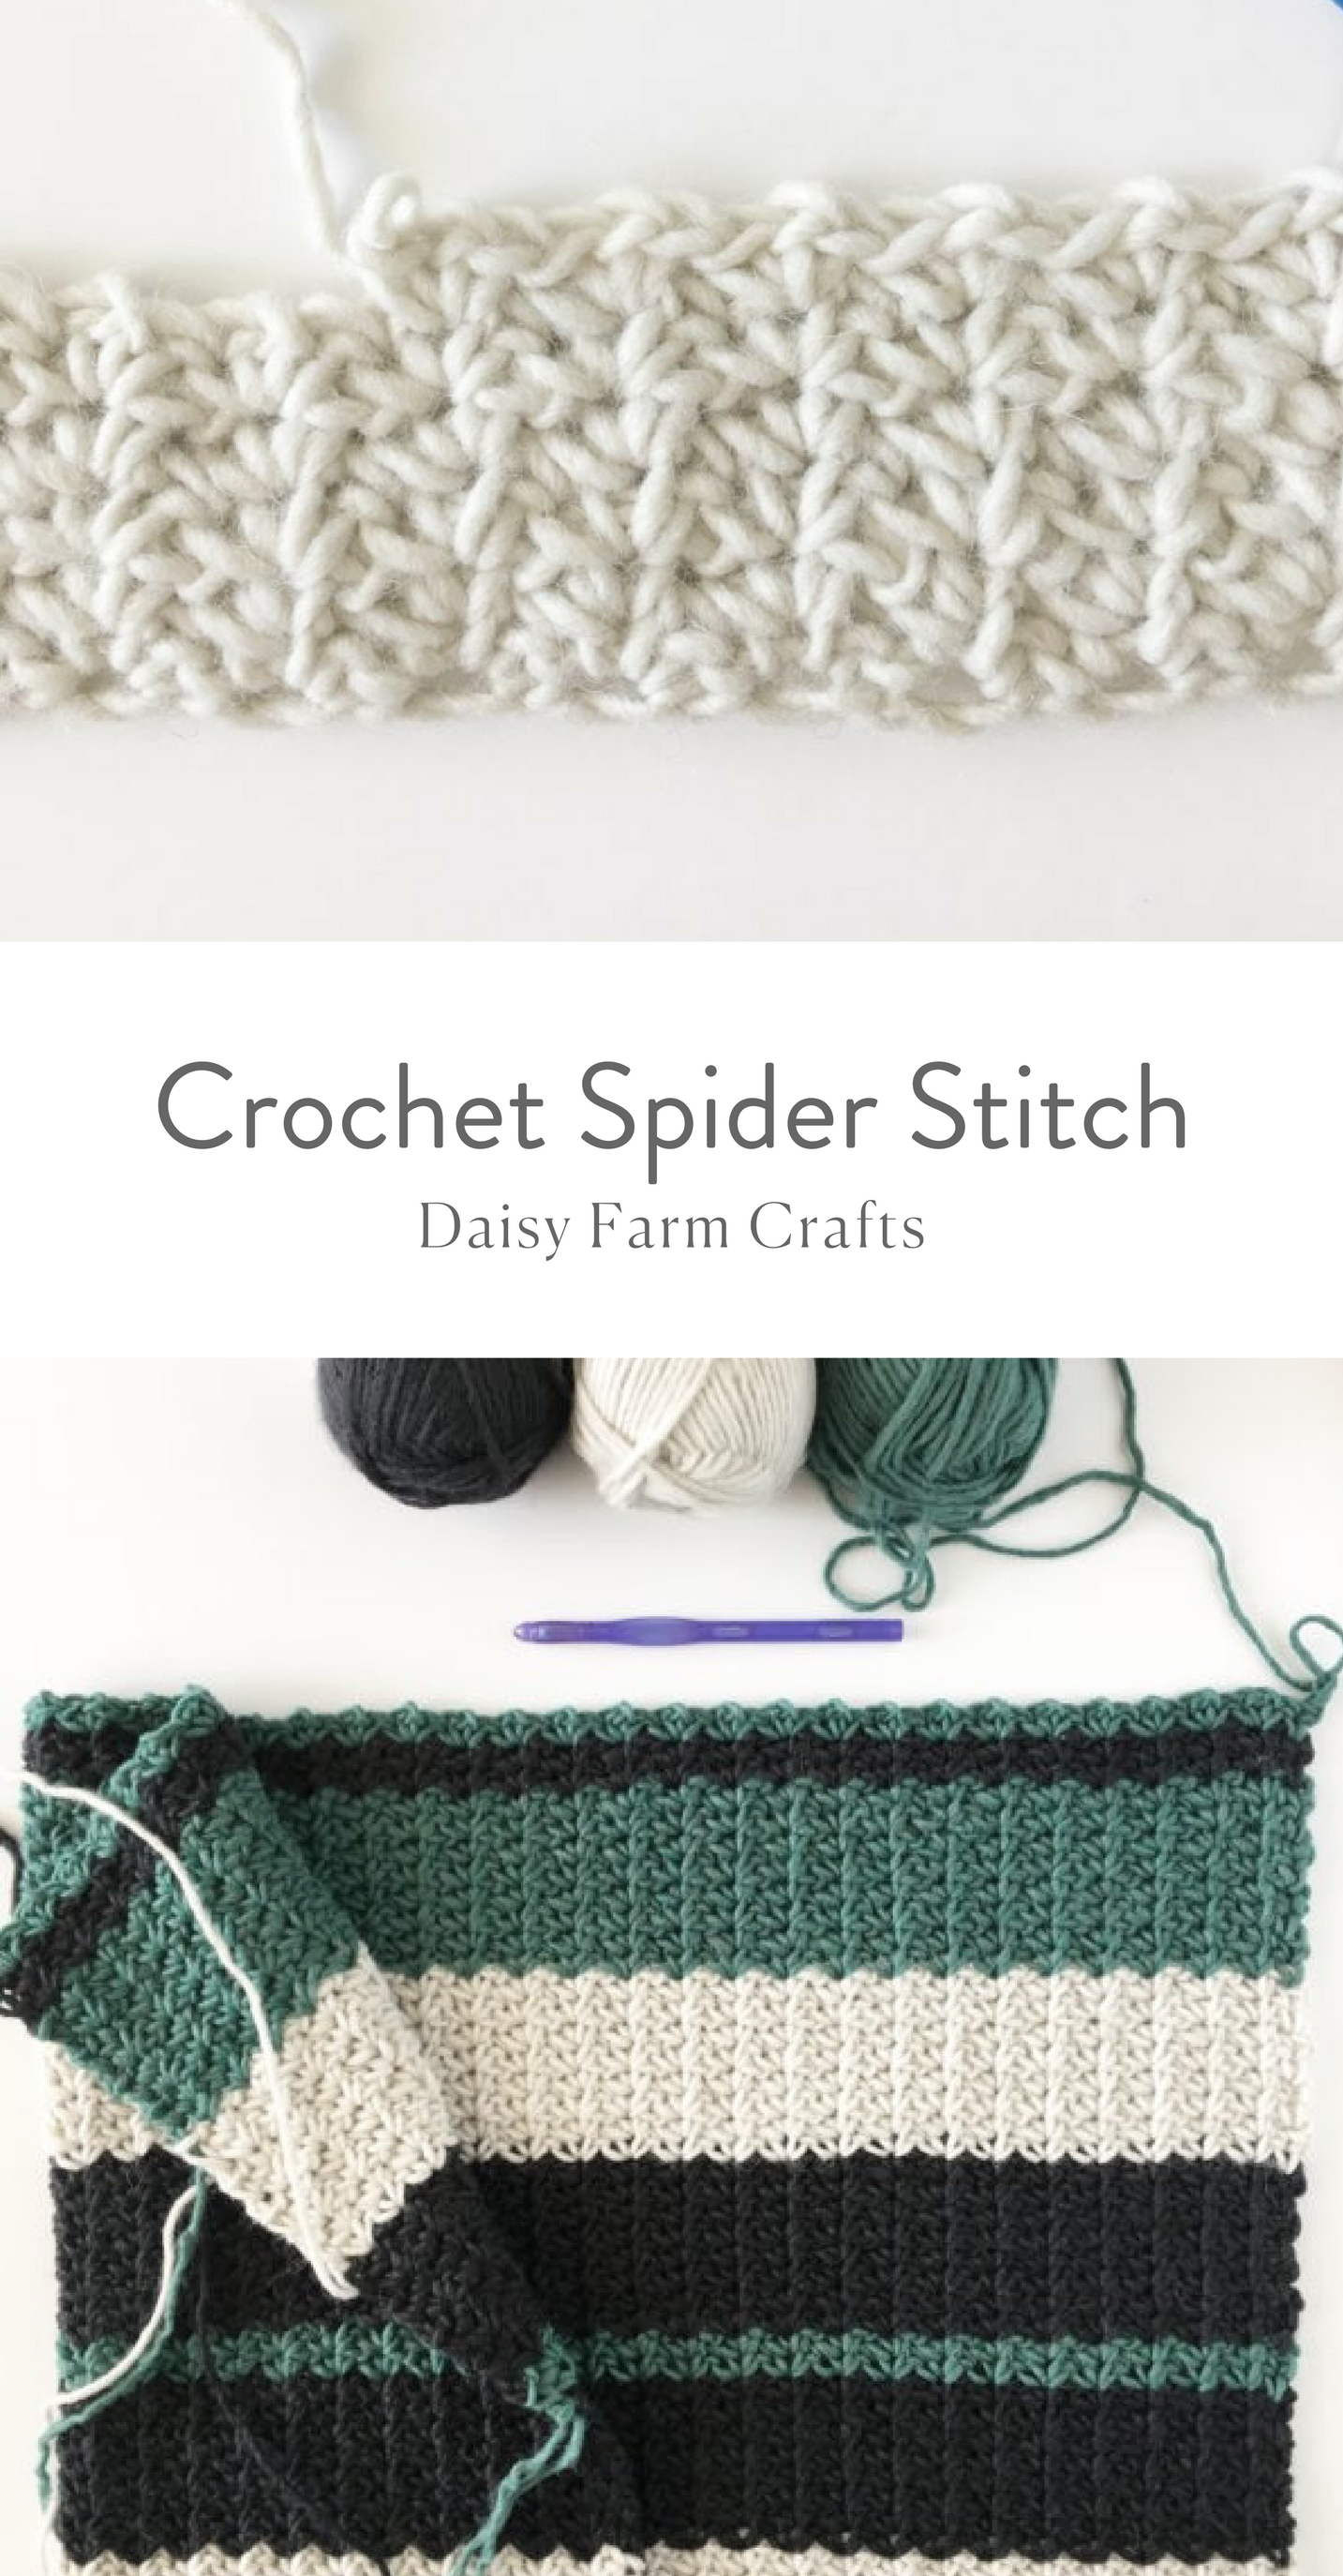 Crochet Spider Stitch - Daisy Farm Crafts   Crochet > All things ...